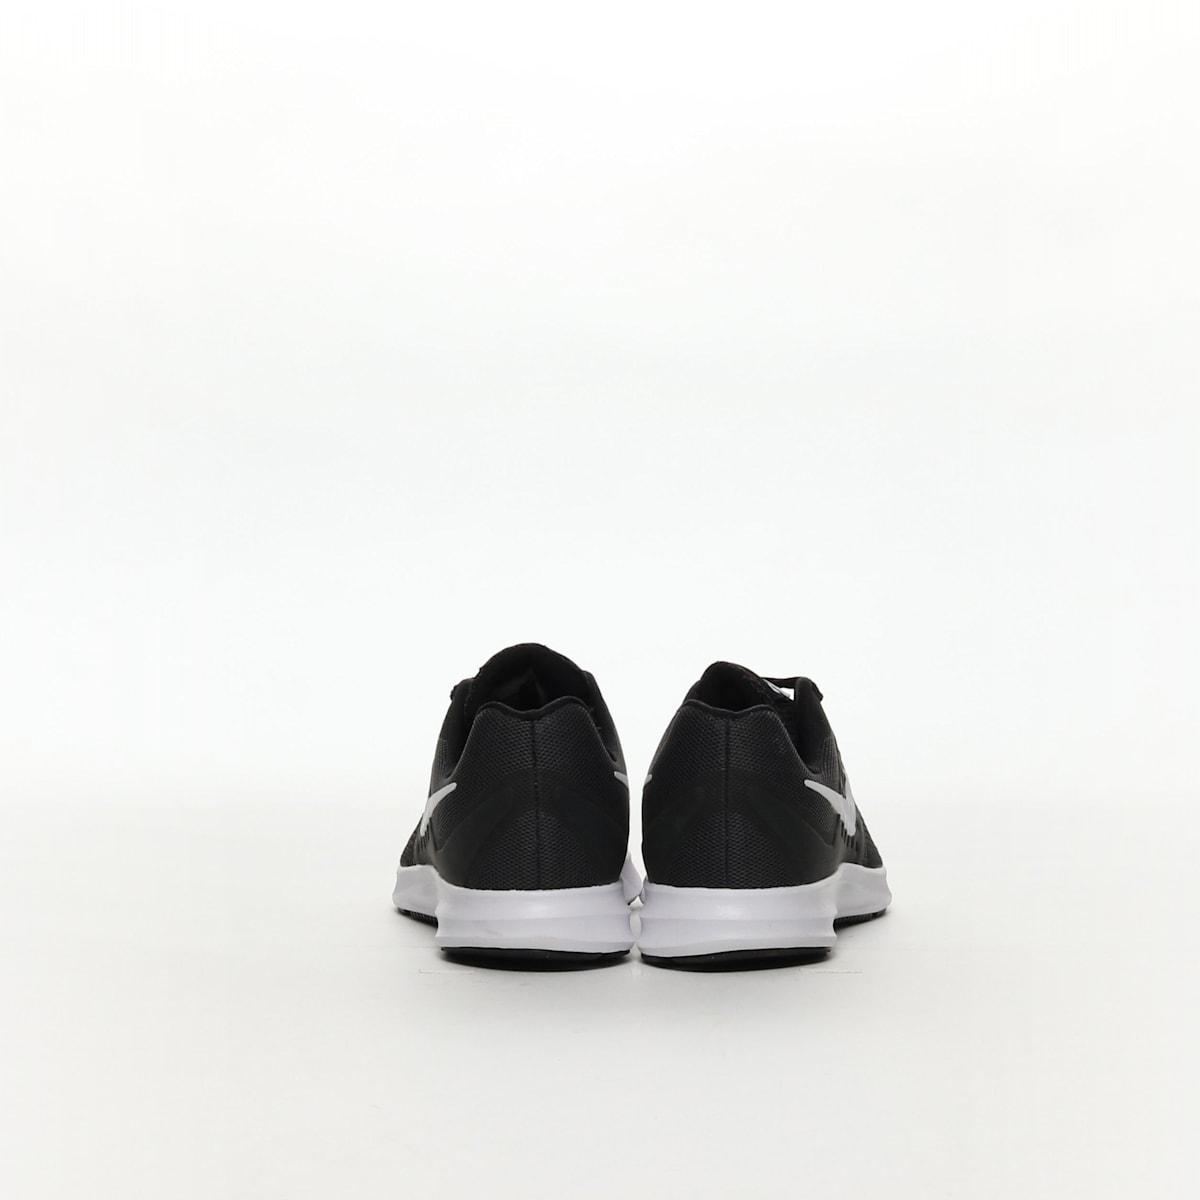 Nike downshifter 7 wide